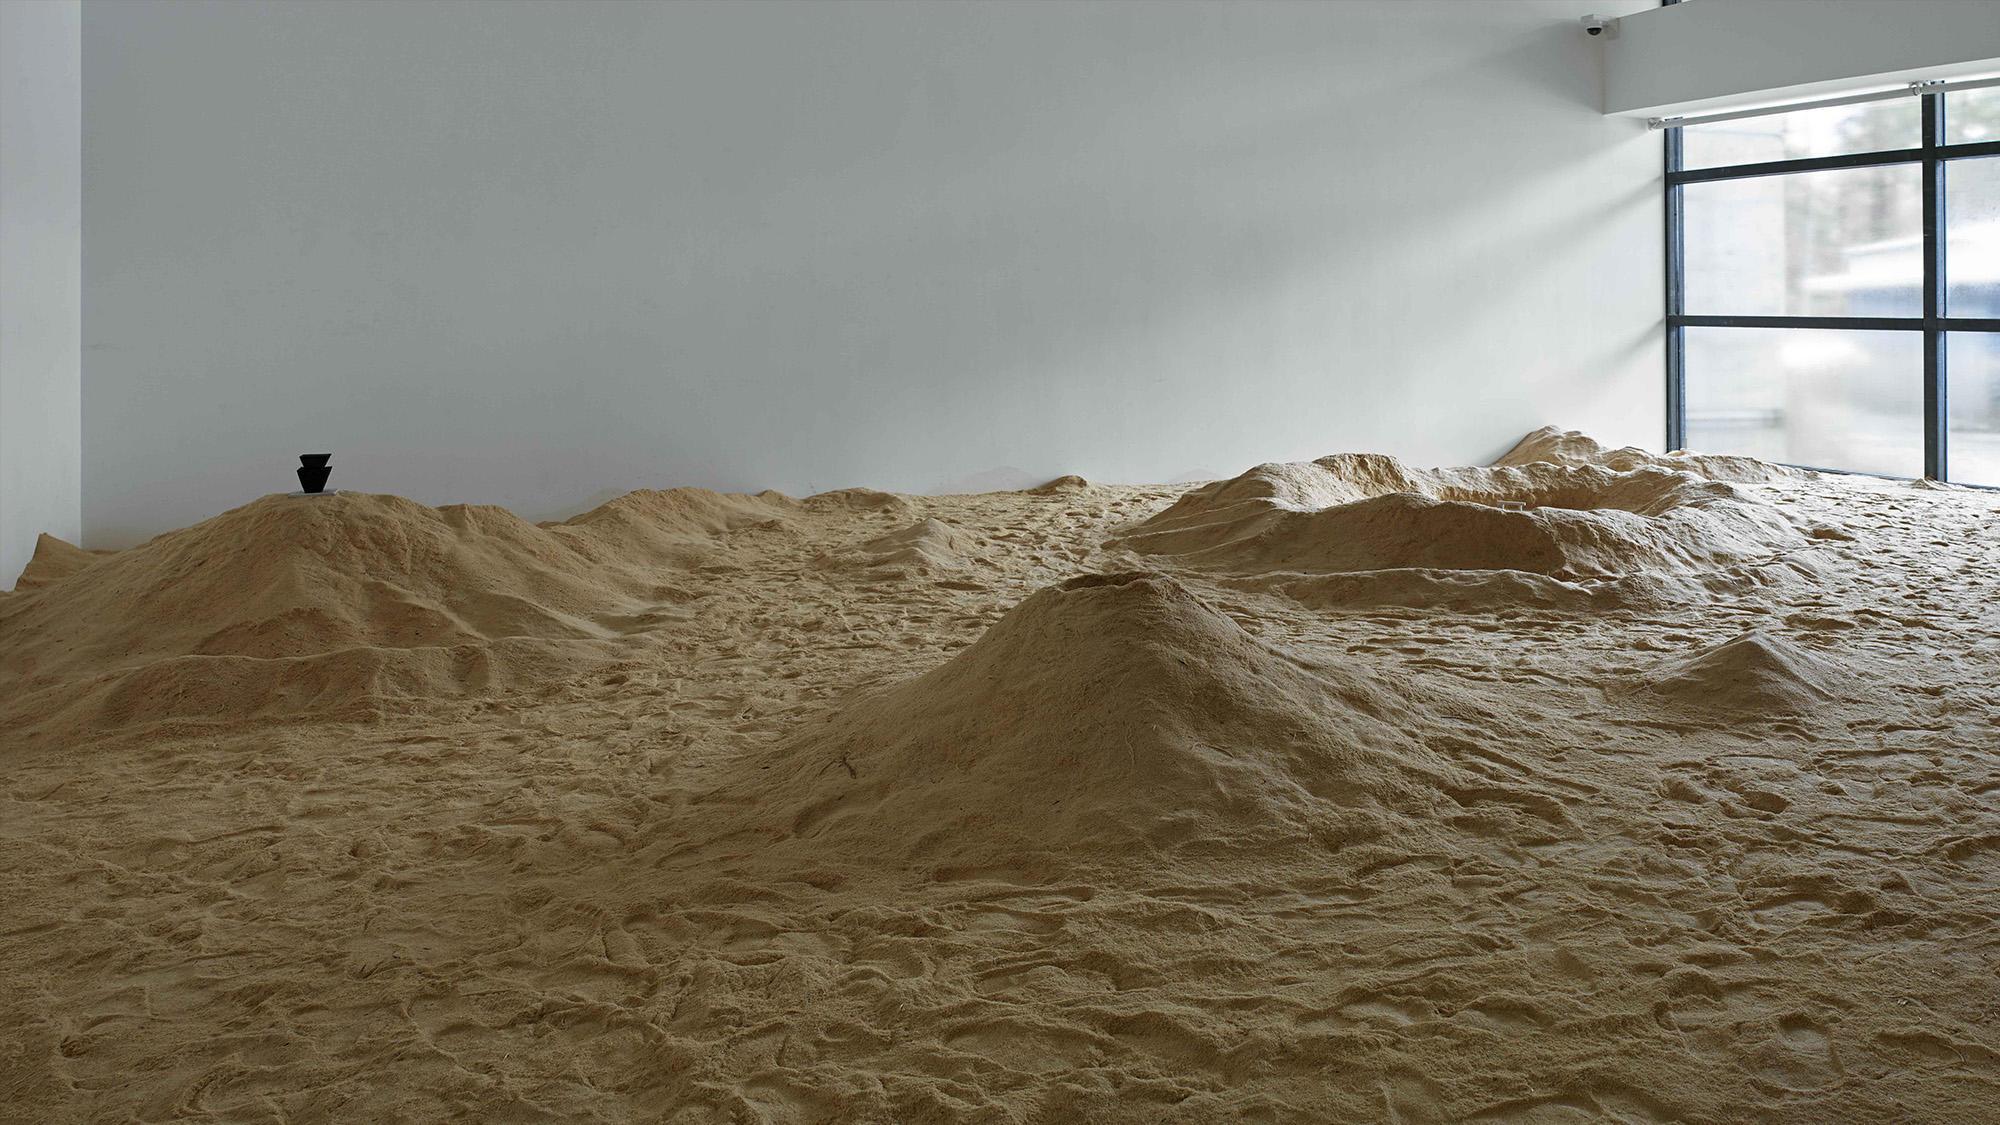 Residual landscape © YAMAMOTO Tadasu / Elmo Vermijs